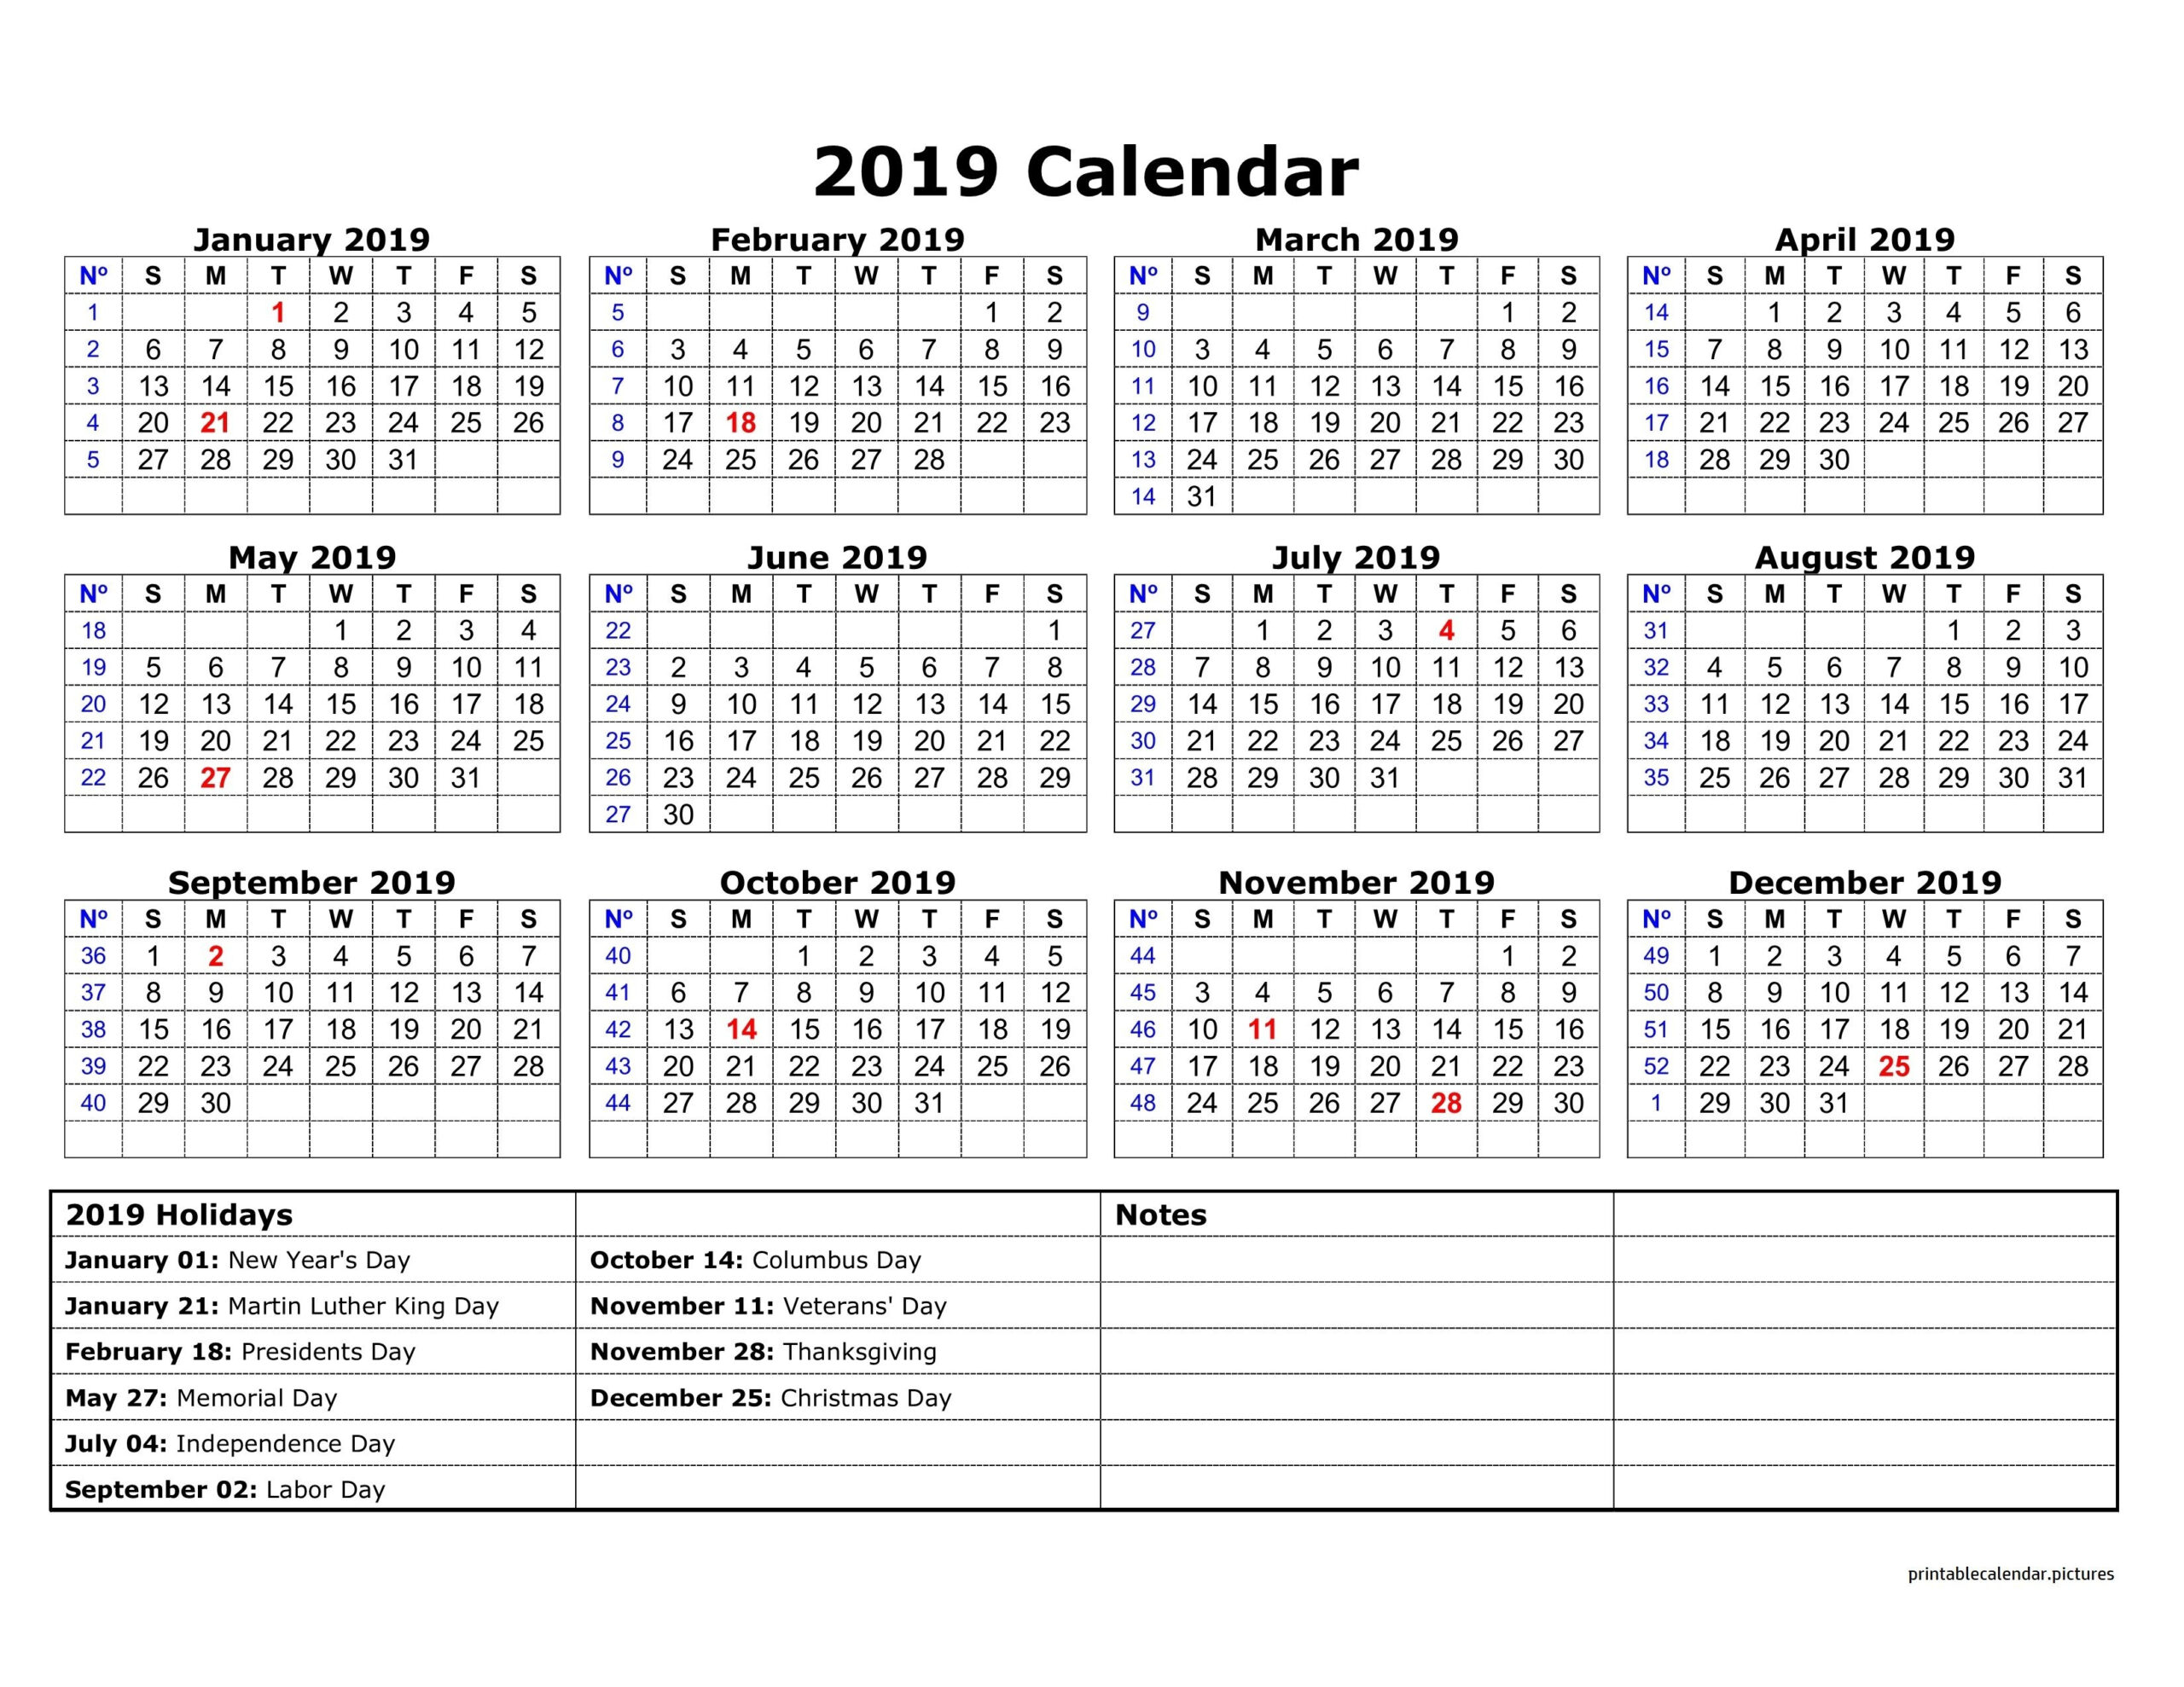 Australian Calendar 2019 Printable | Qualads within Important Awarness Dates 2021 Australia